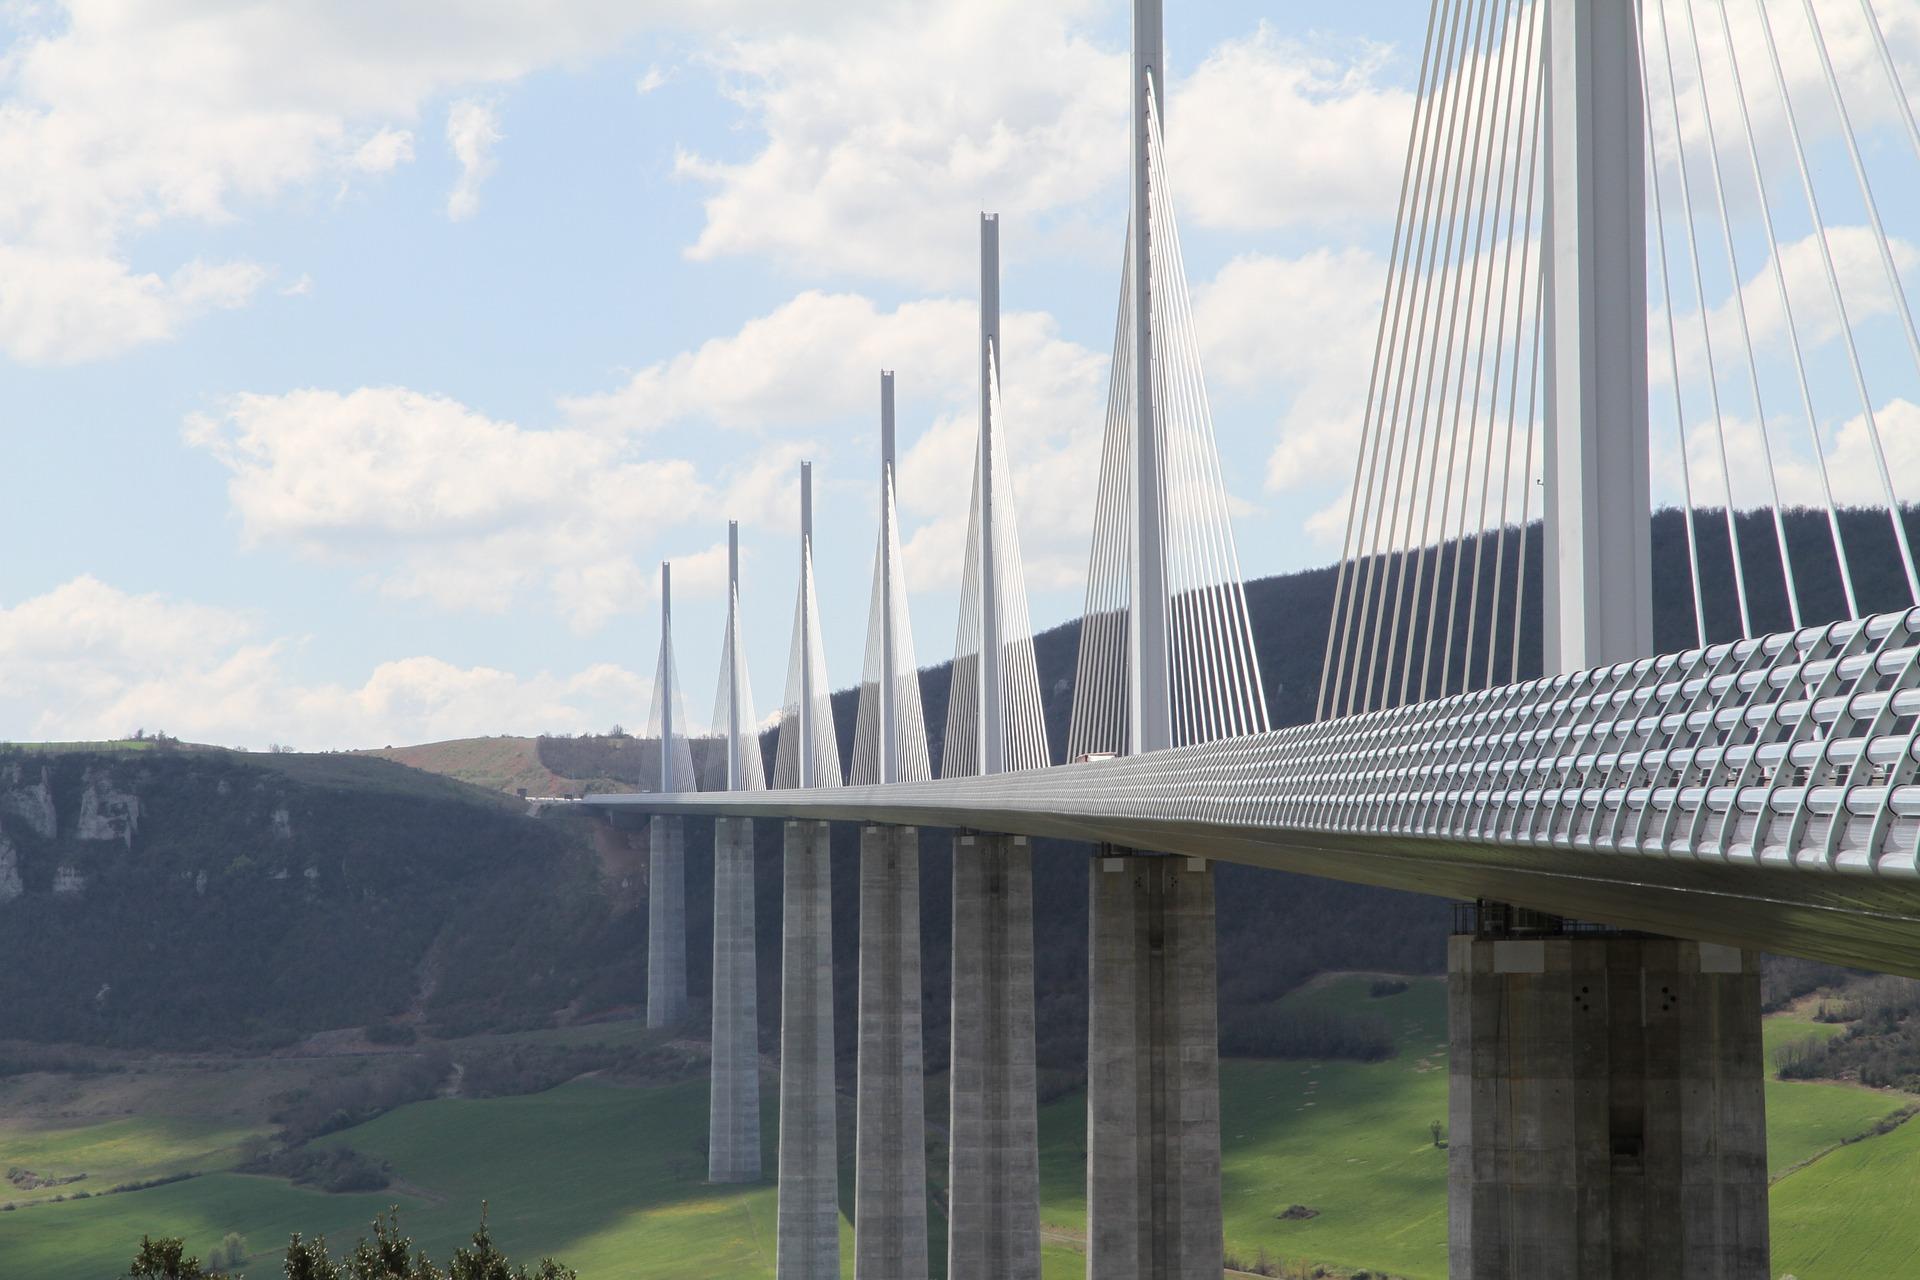 Pont_de_Millau_CC0.jpg?1545475671